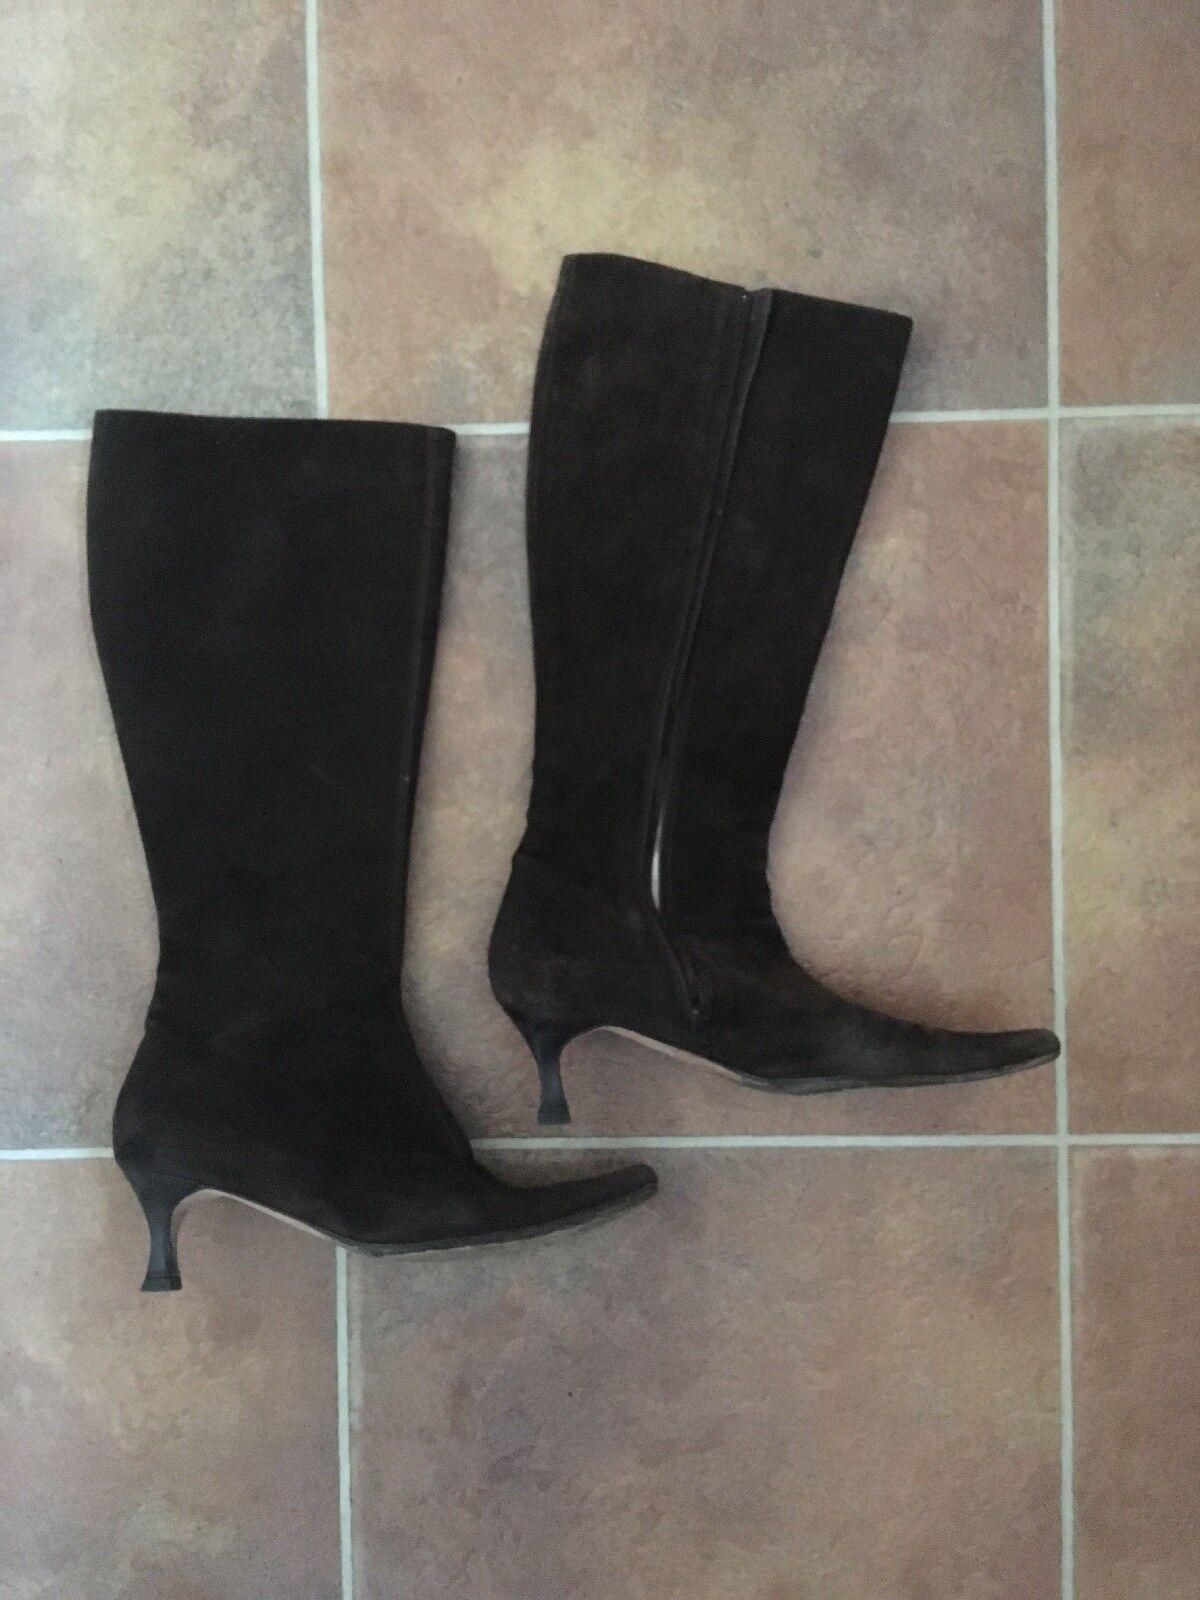 Hobbs Brown Brown Brown Kitten Heal Suede Long Boots Size 7 41cdfe